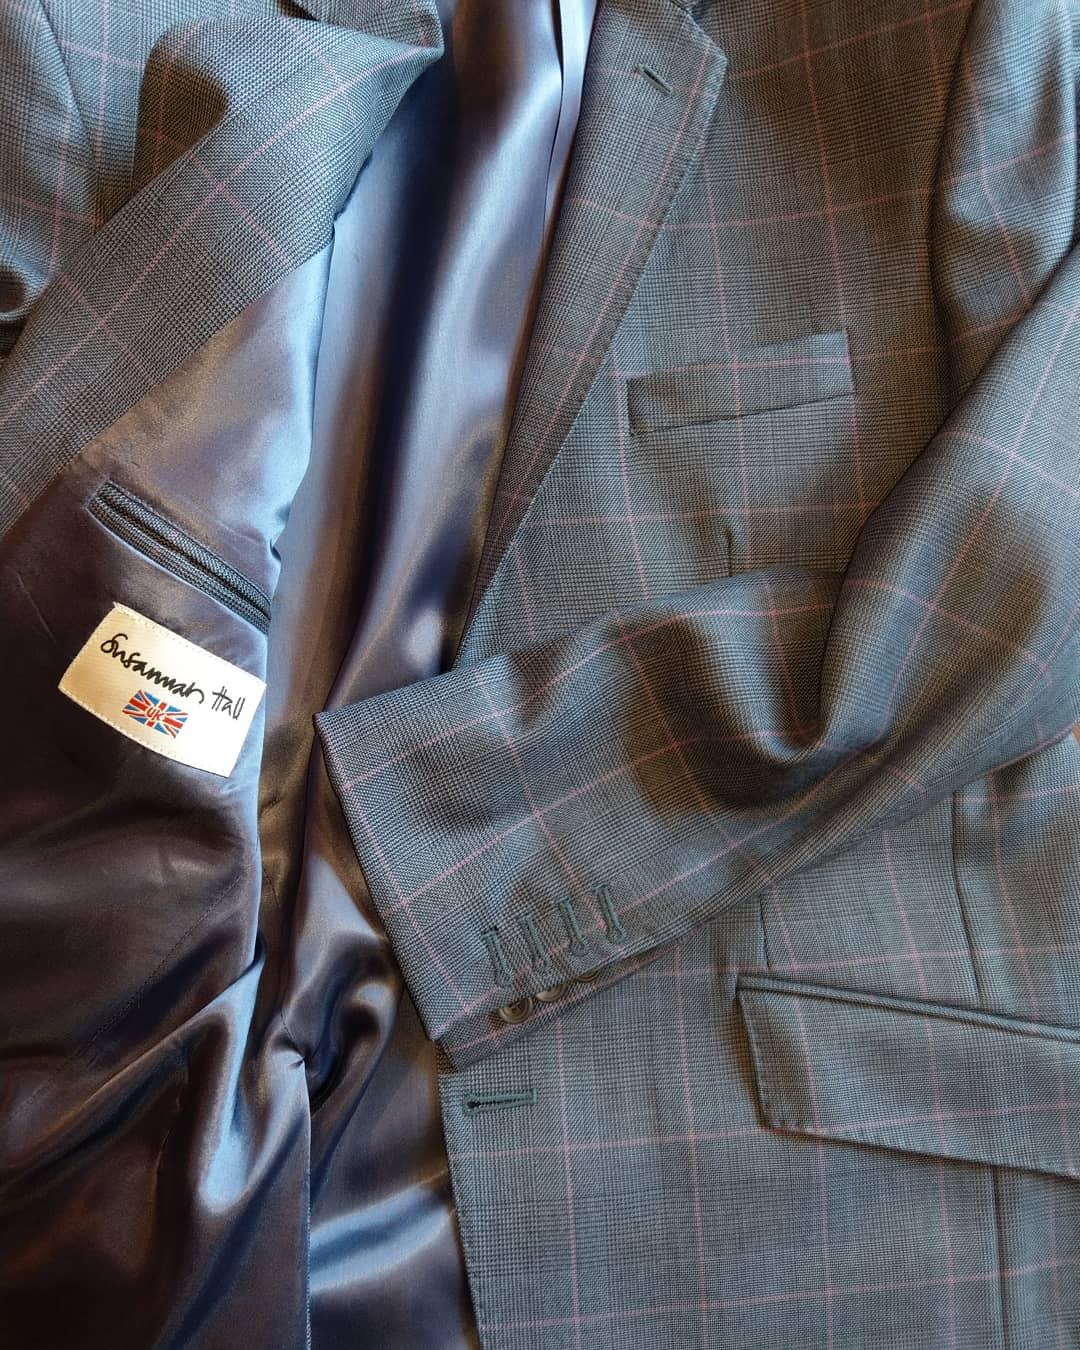 susannah-hall-bepsoke-tailor-suit-prince-wales-check-holland-sherry-uk-made-britain.jpg